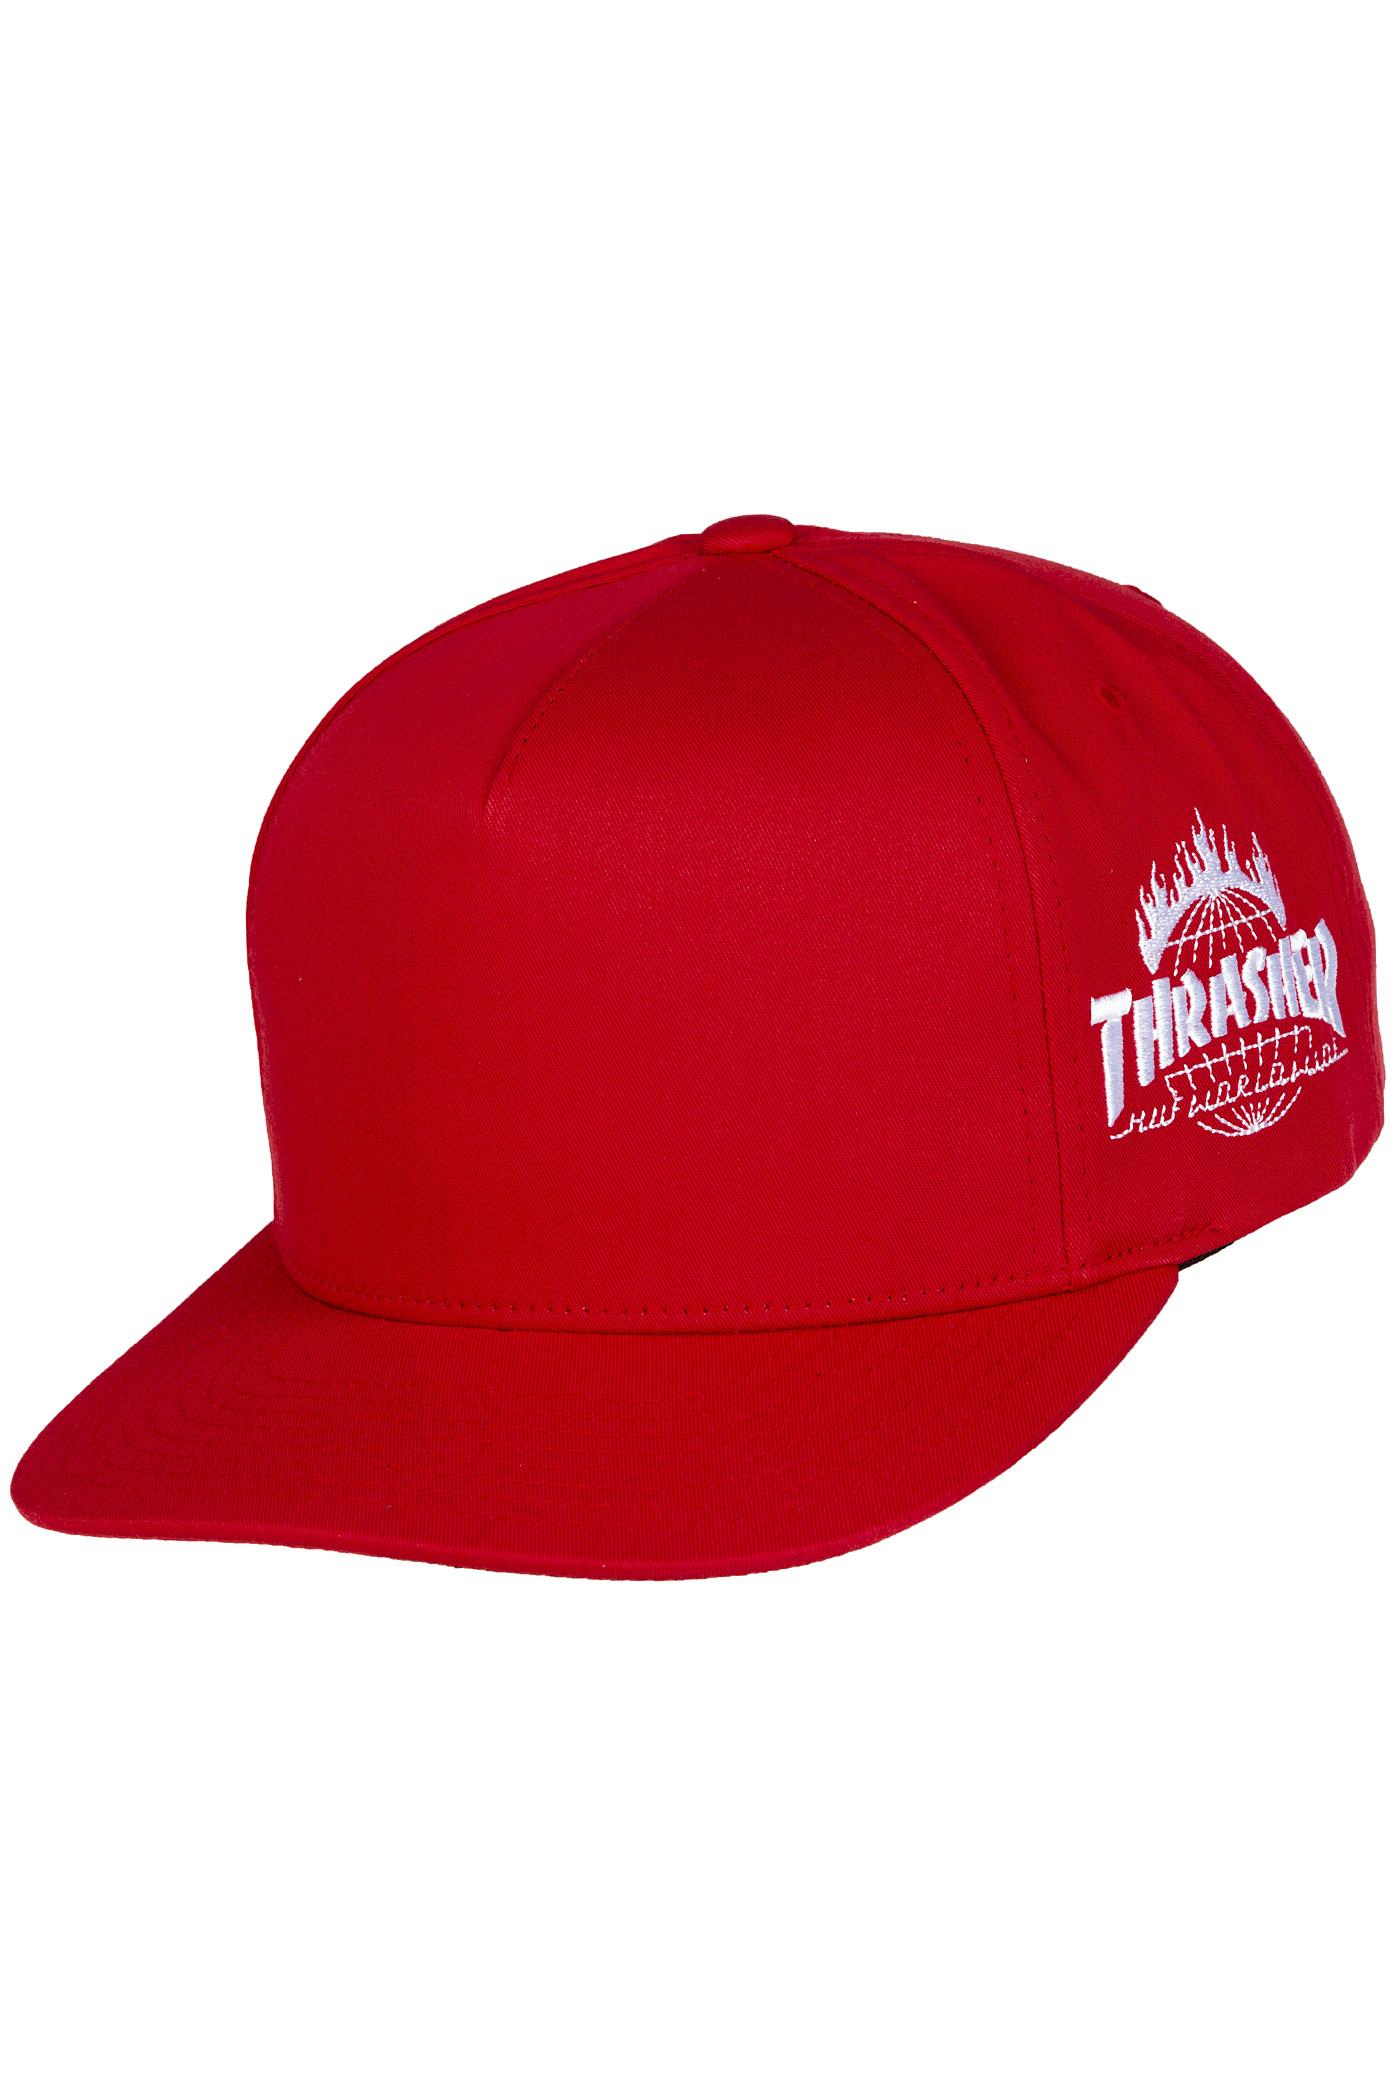 HUF x Thrasher TDS Snapback Cap (red) buy at skatedeluxe 4d835dacf2f1